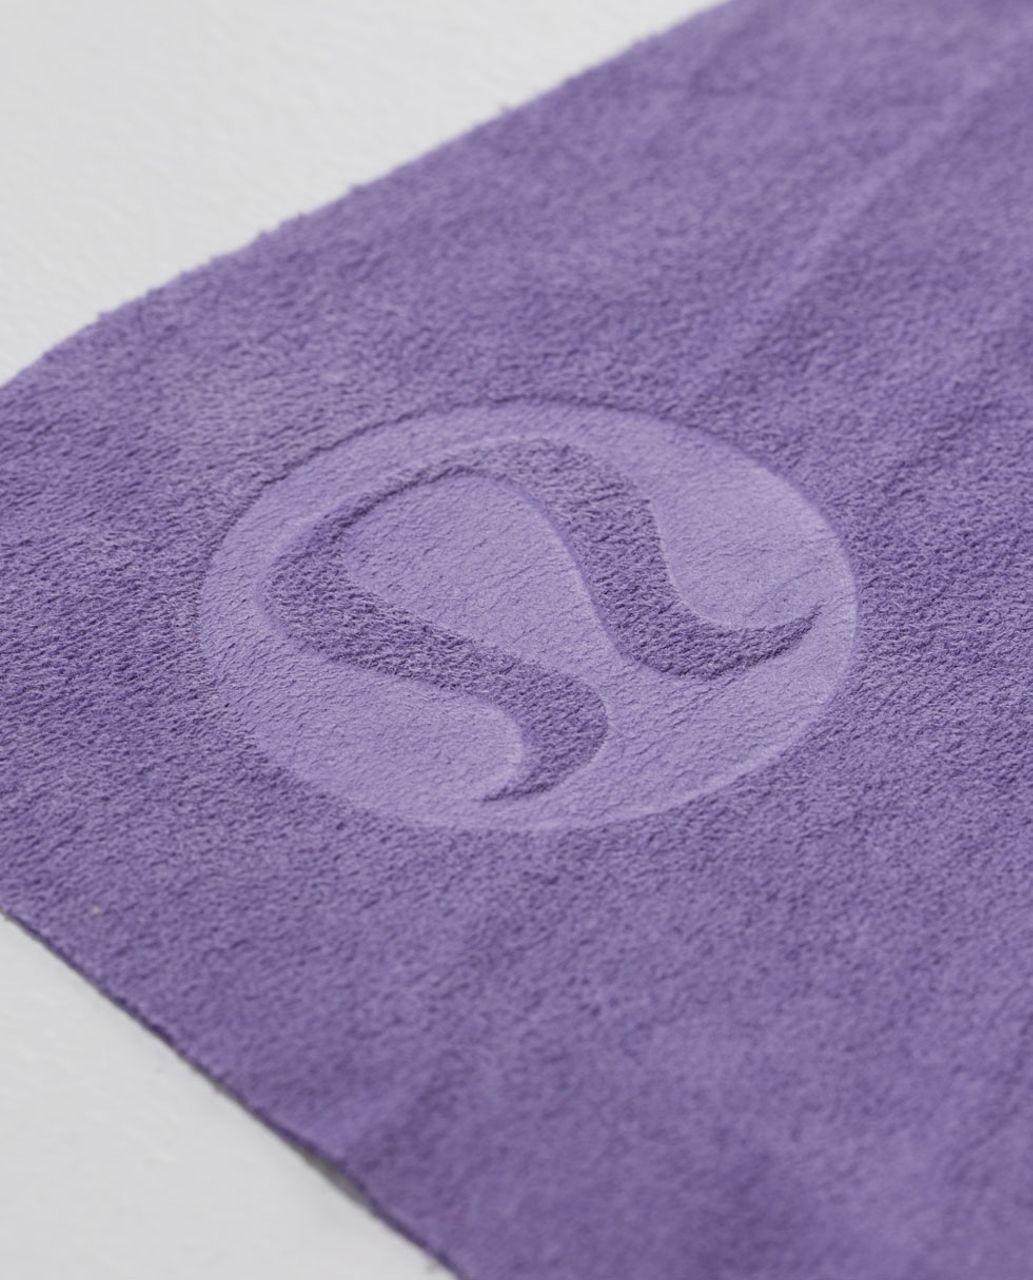 Lululemon The Towel - Winter Orchid